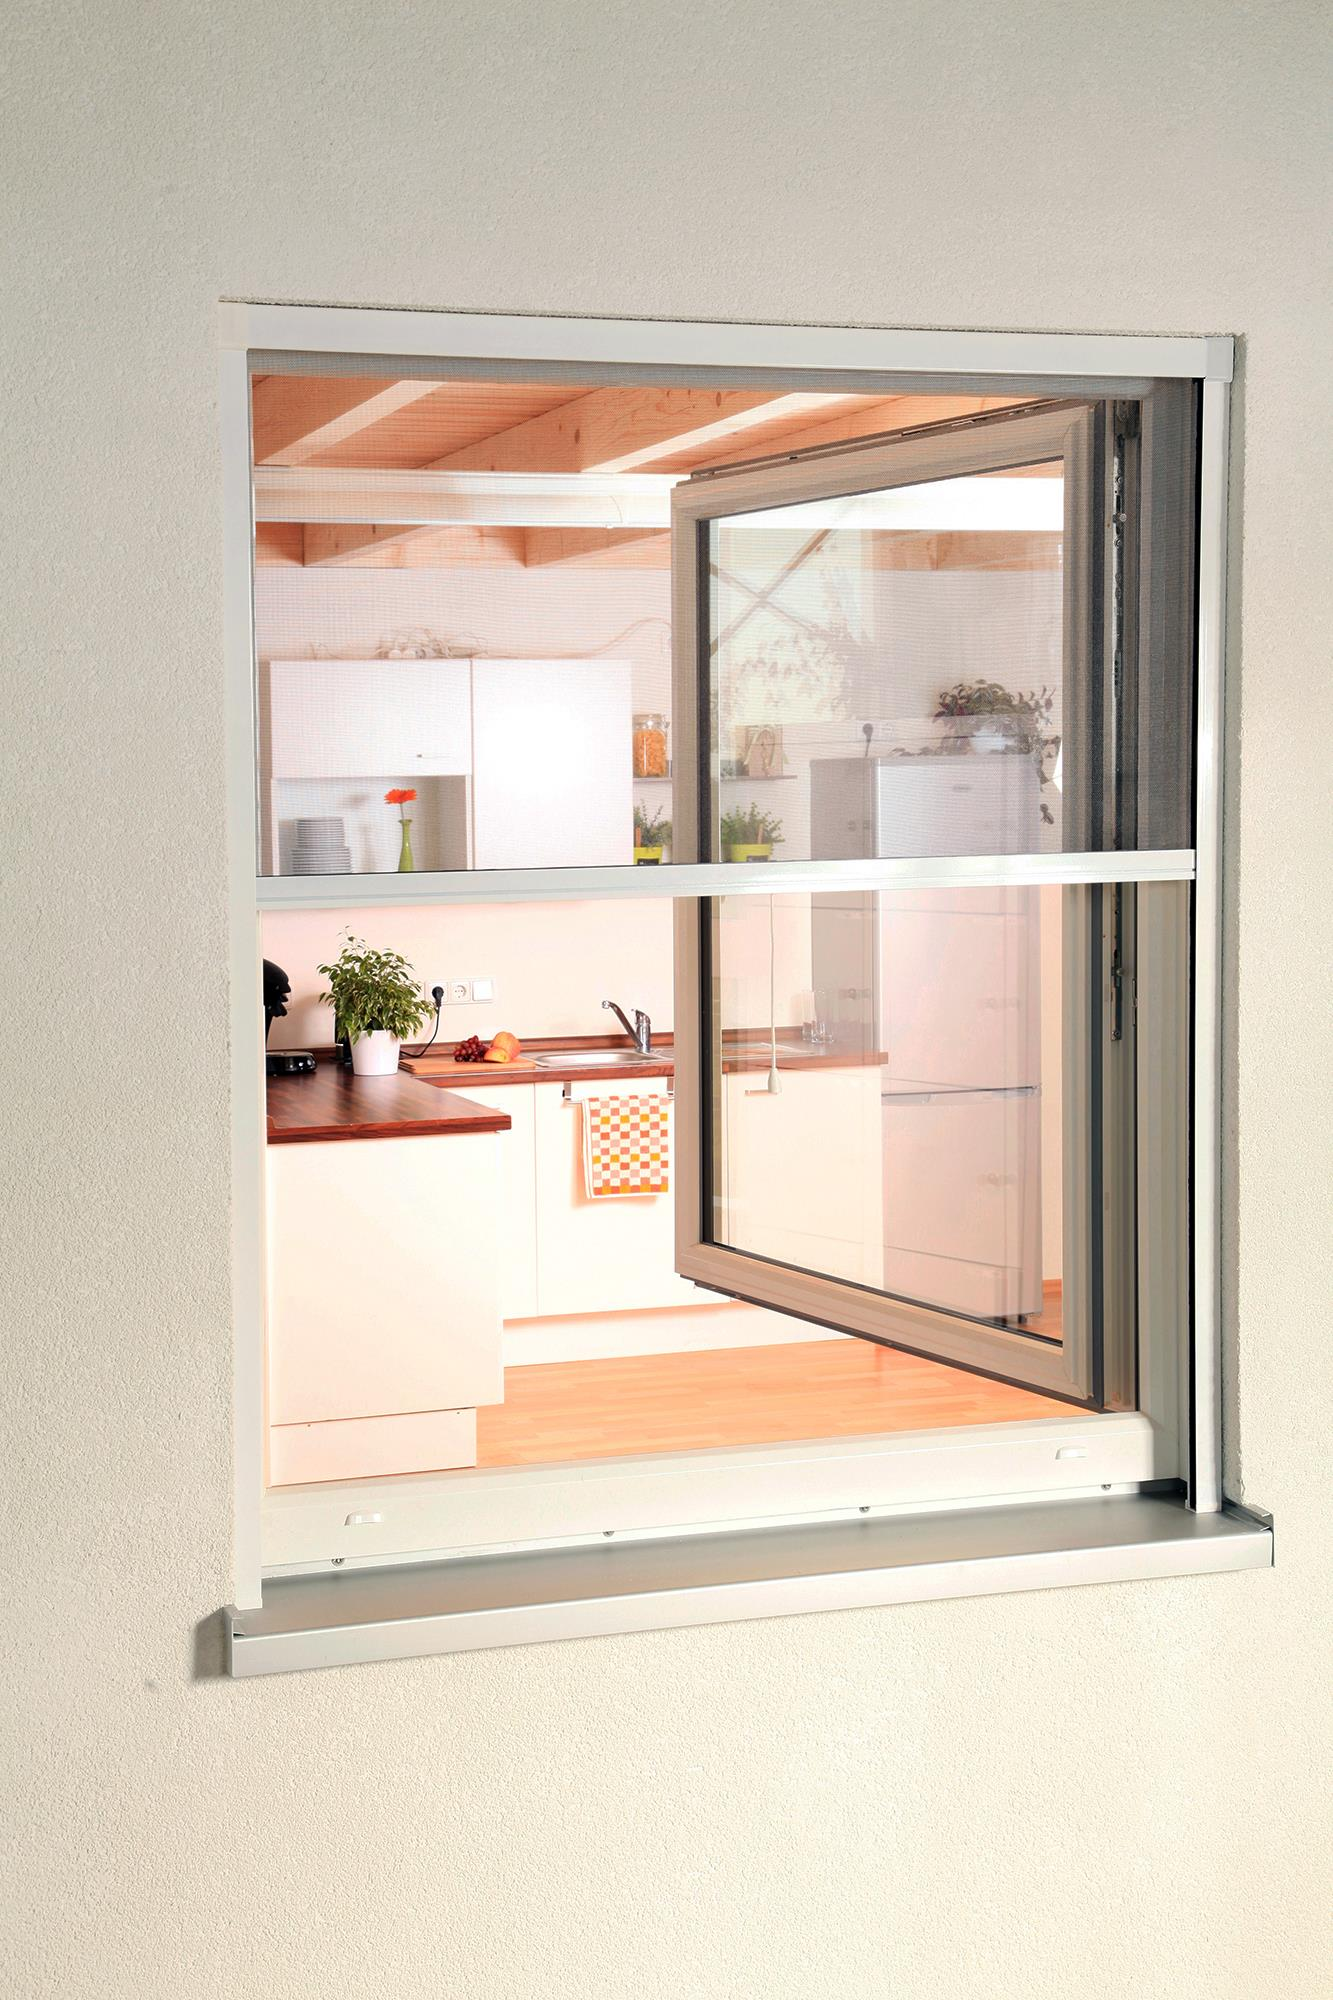 insektenschutzrollo smart fliegengitter rollo f r. Black Bedroom Furniture Sets. Home Design Ideas